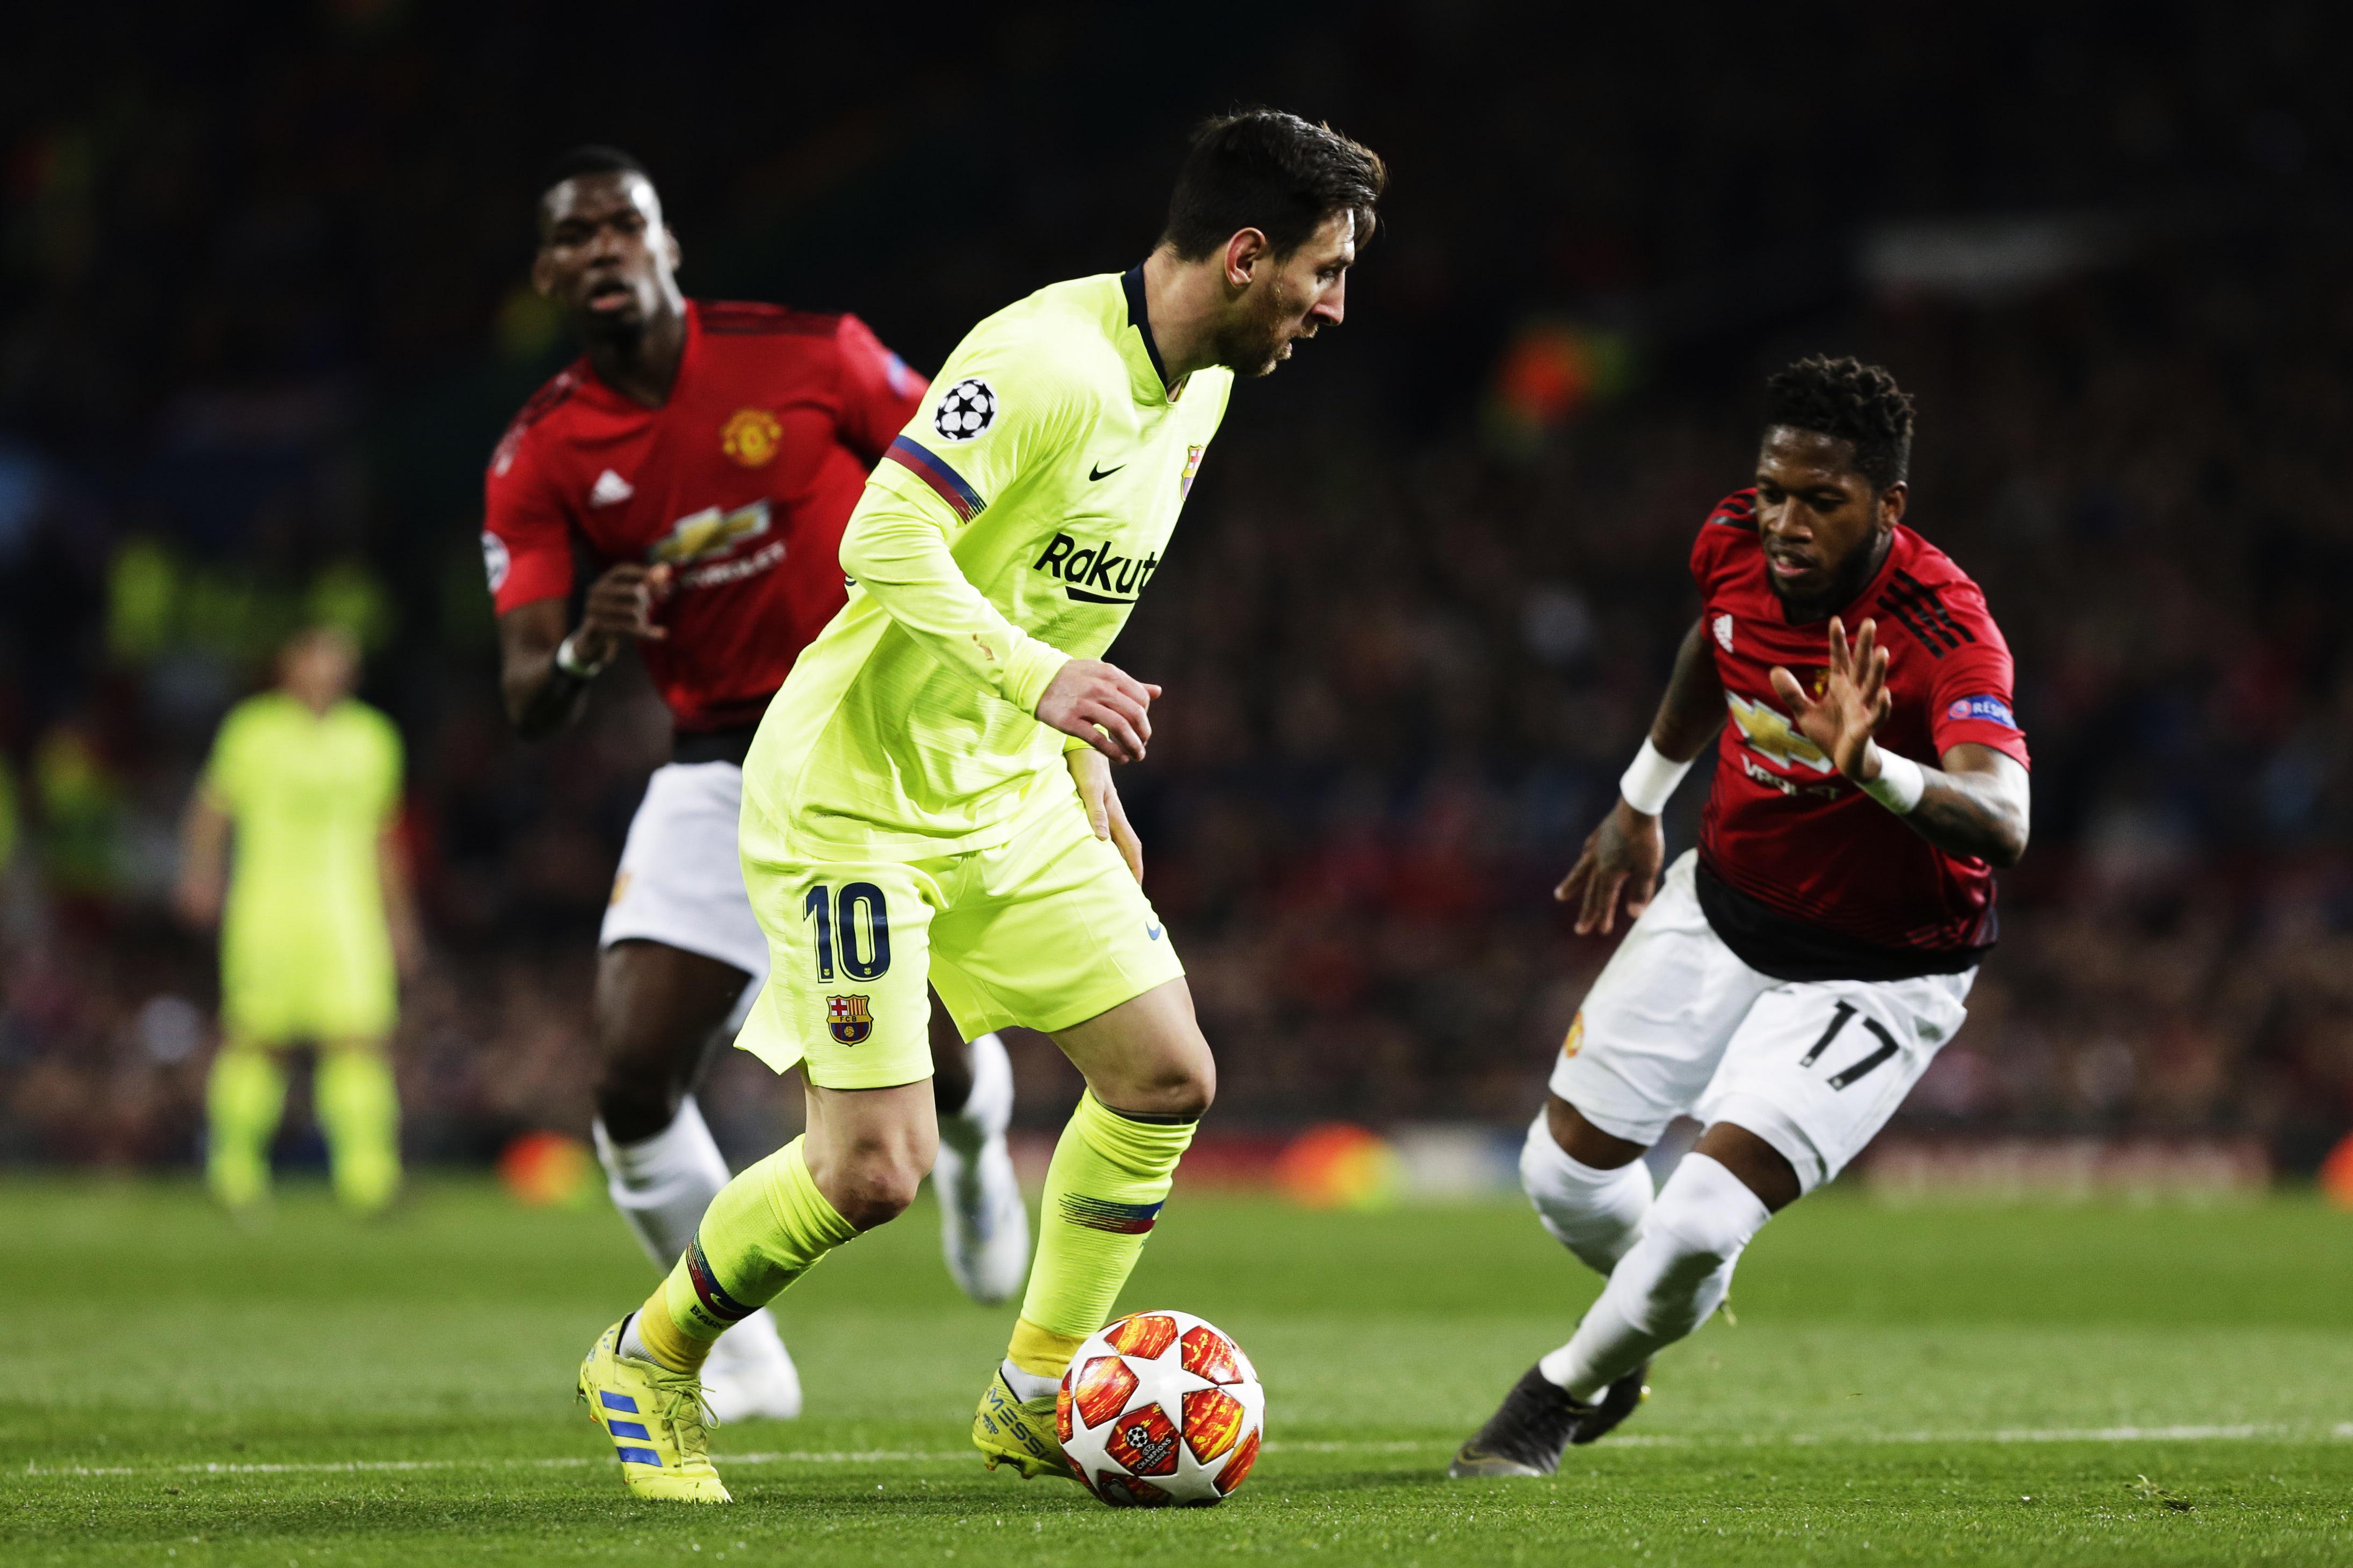 Chelsea Vs Manchester United Vs Fc Barcelona: The Keys To FC Barcelona Vs Manchester United